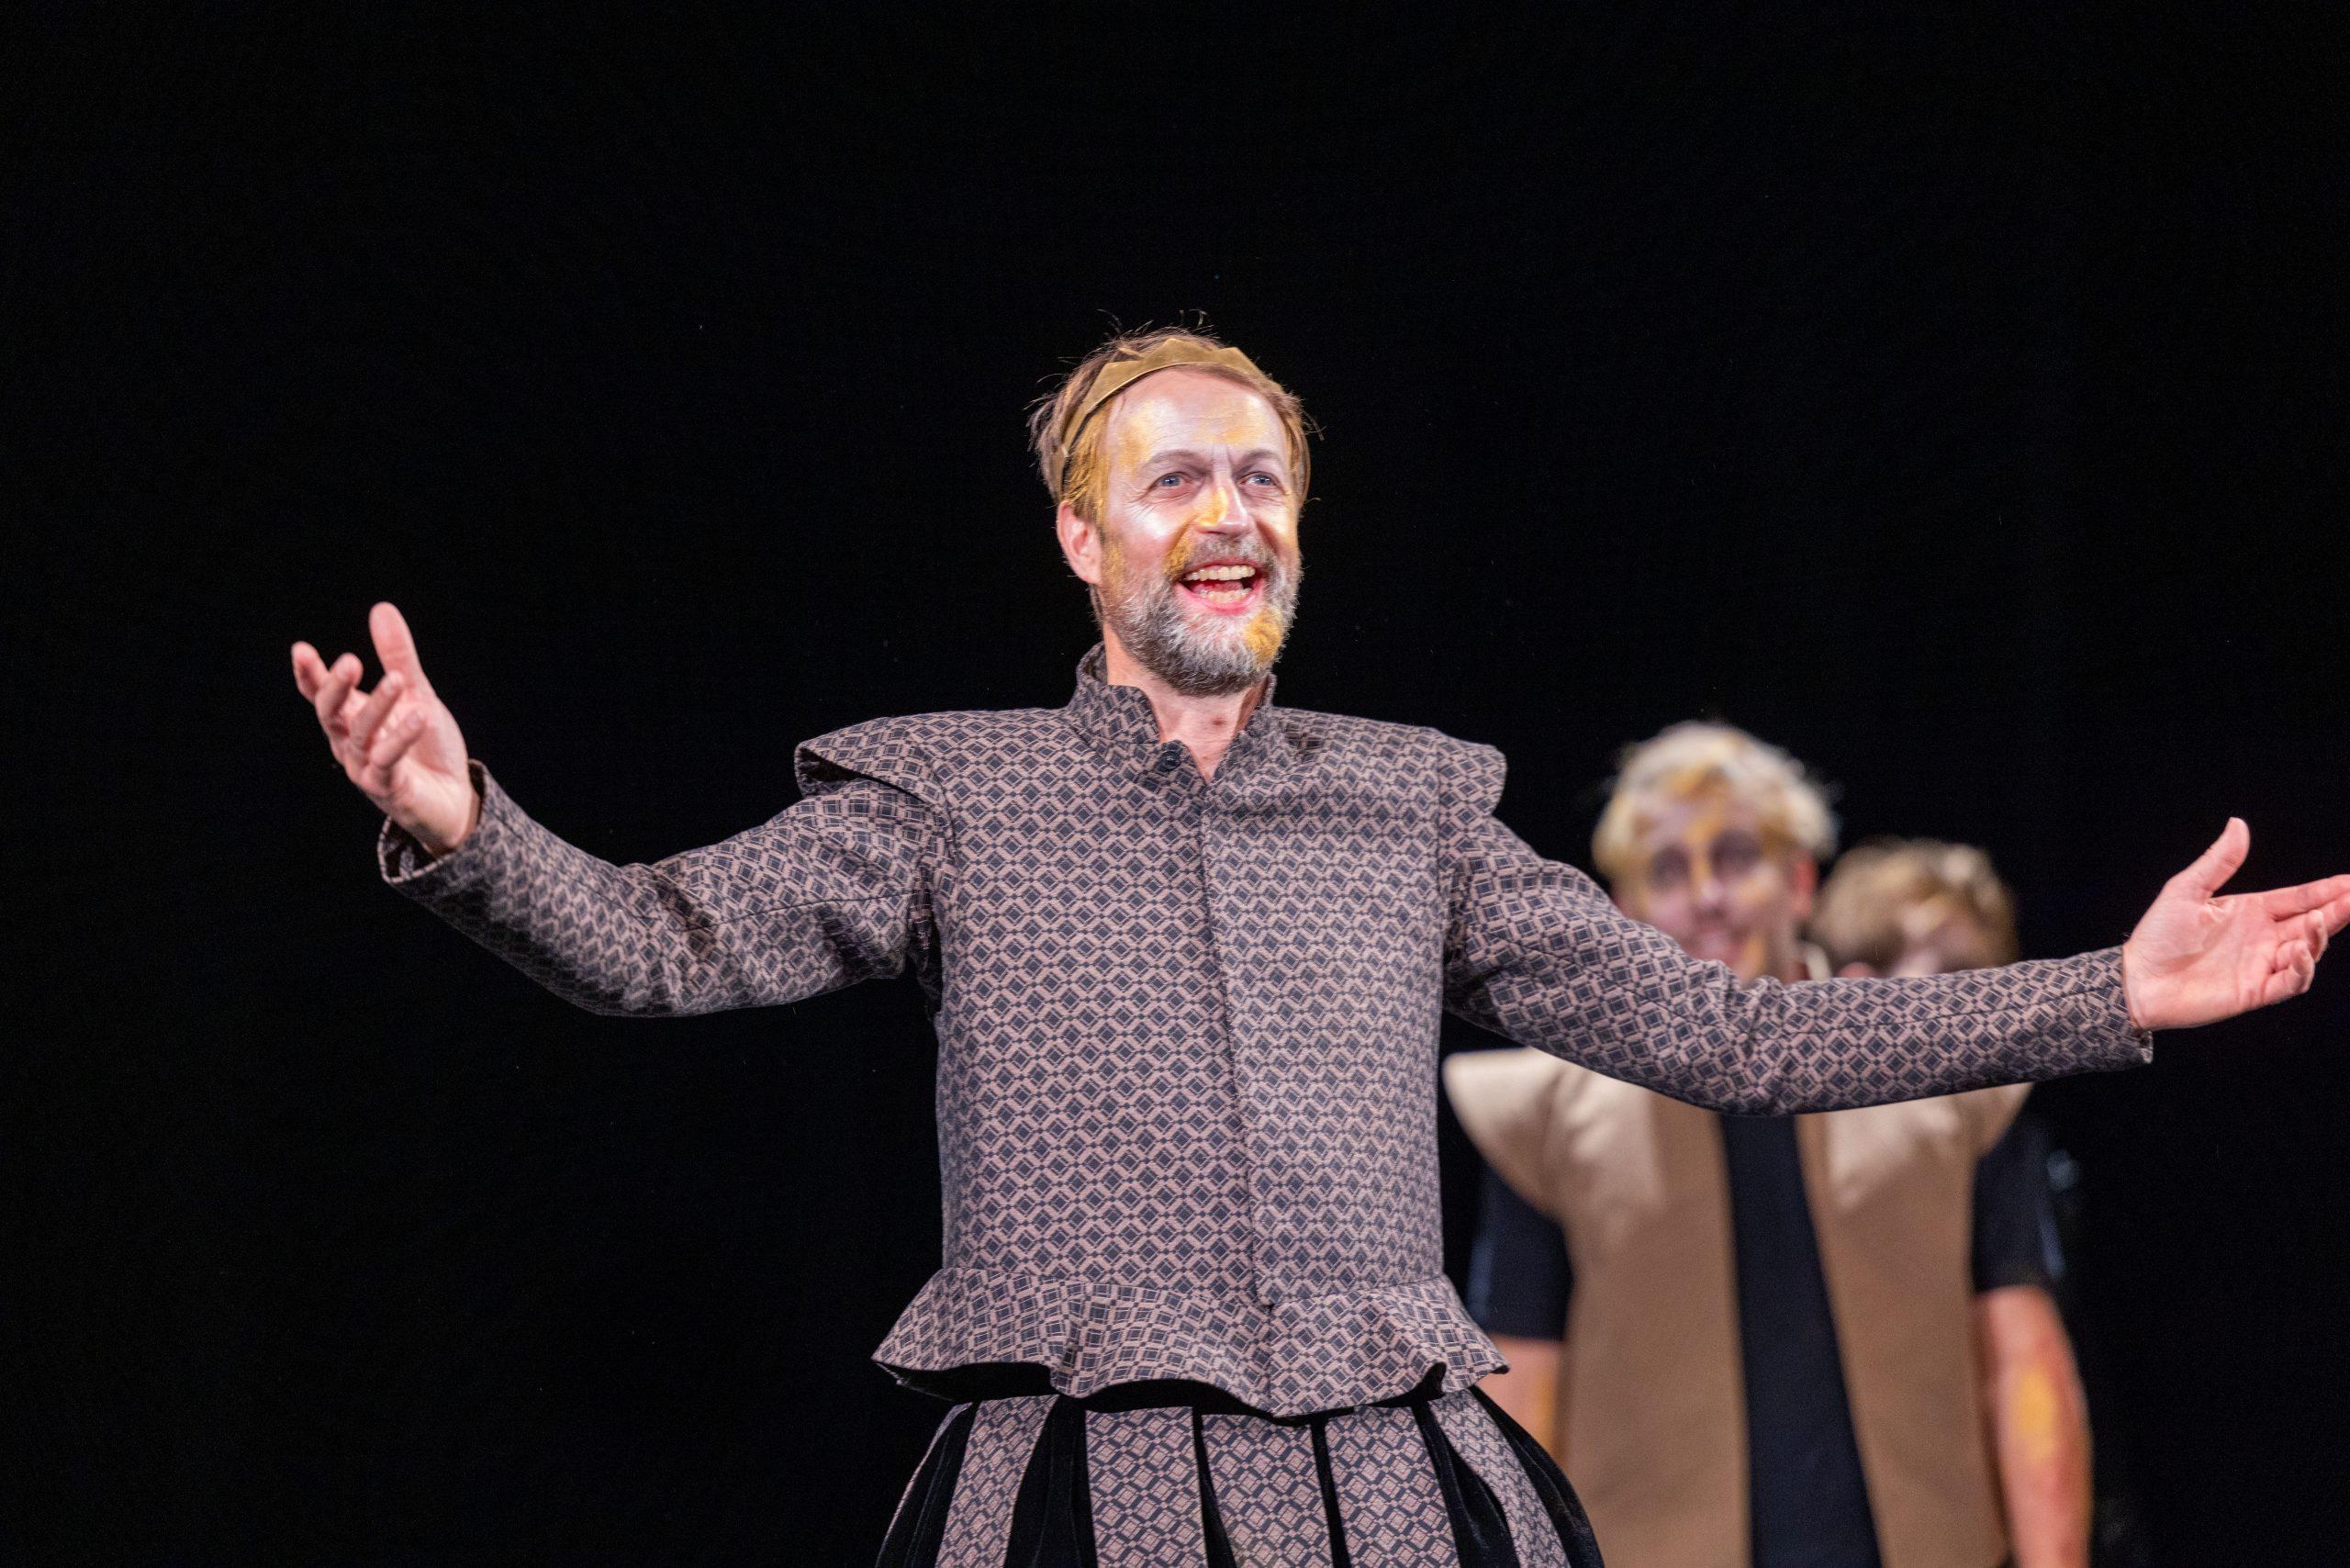 Martin als Duncan in Macbeth, TRheater Lüneburg 2021